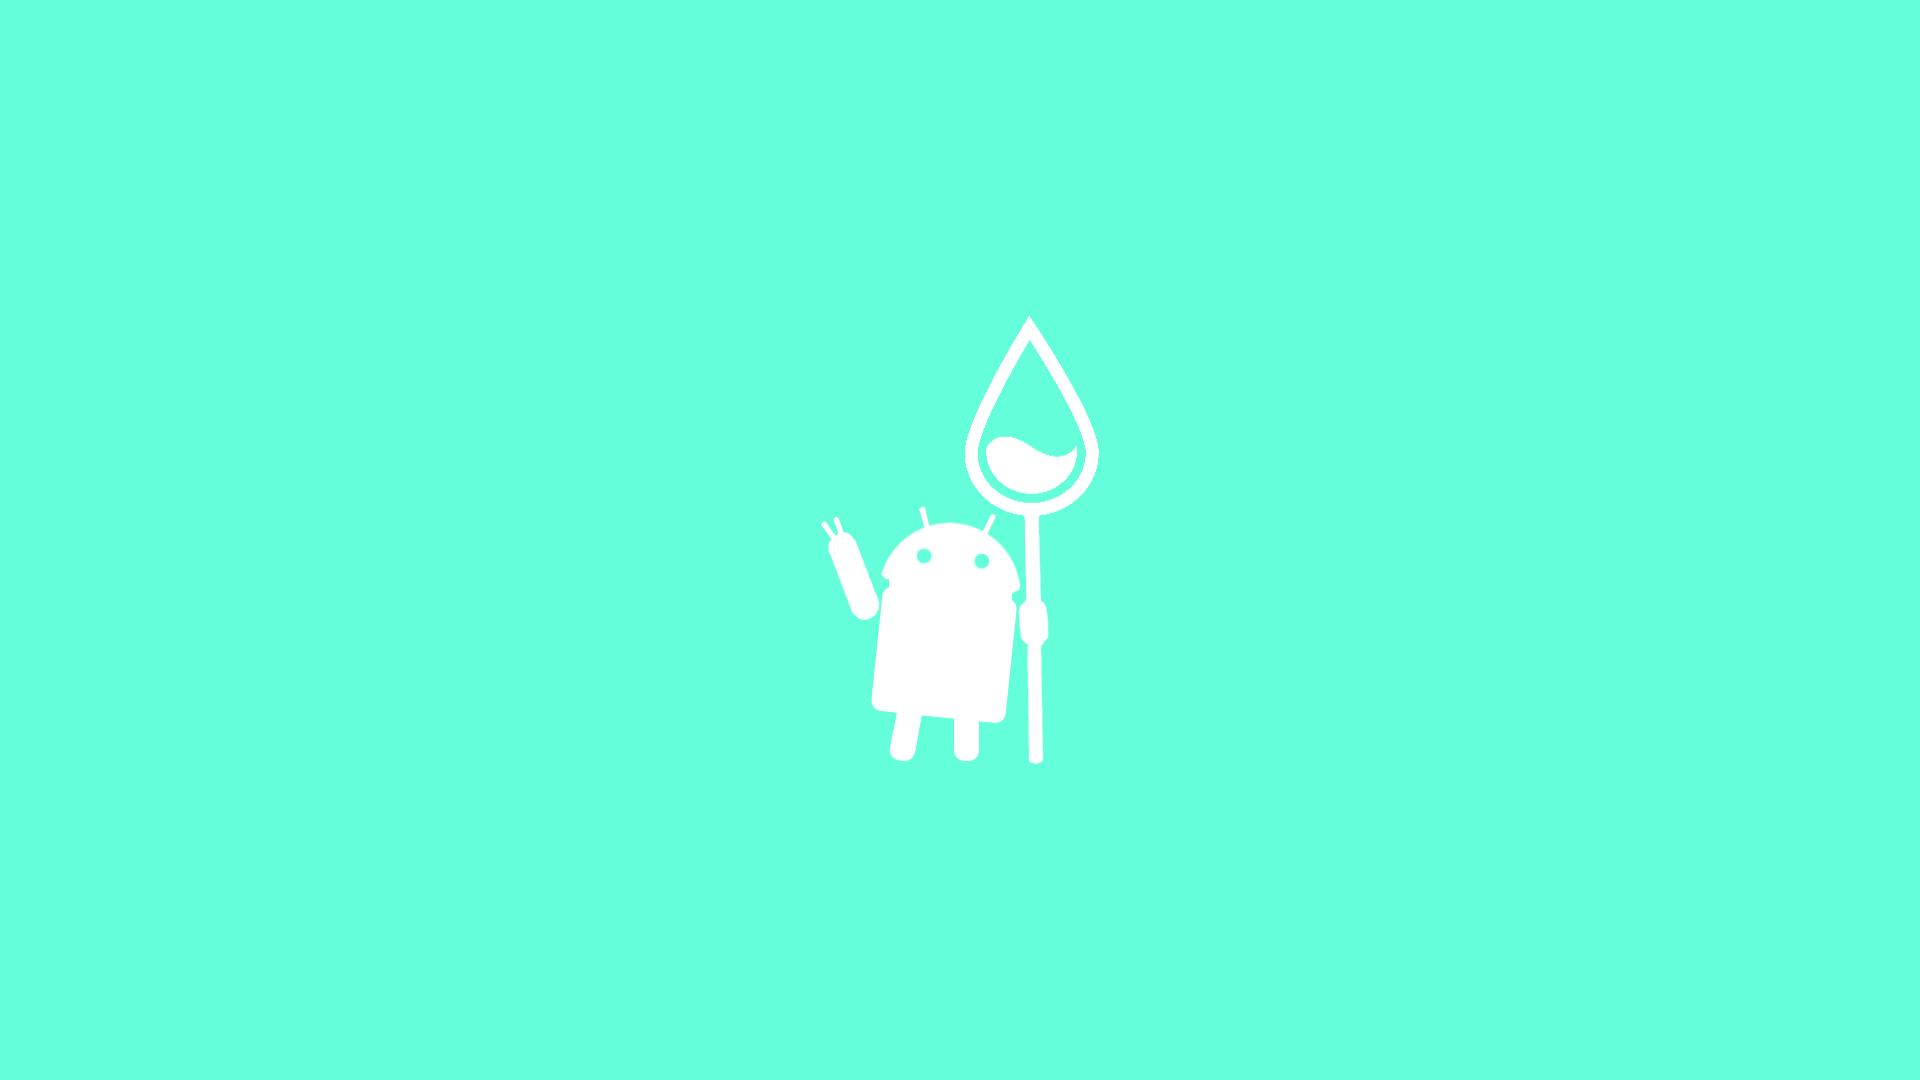 lollipop for rainmeter wallpapers by scoobsti lollipop for rainmeter wallpapers by scoobsti